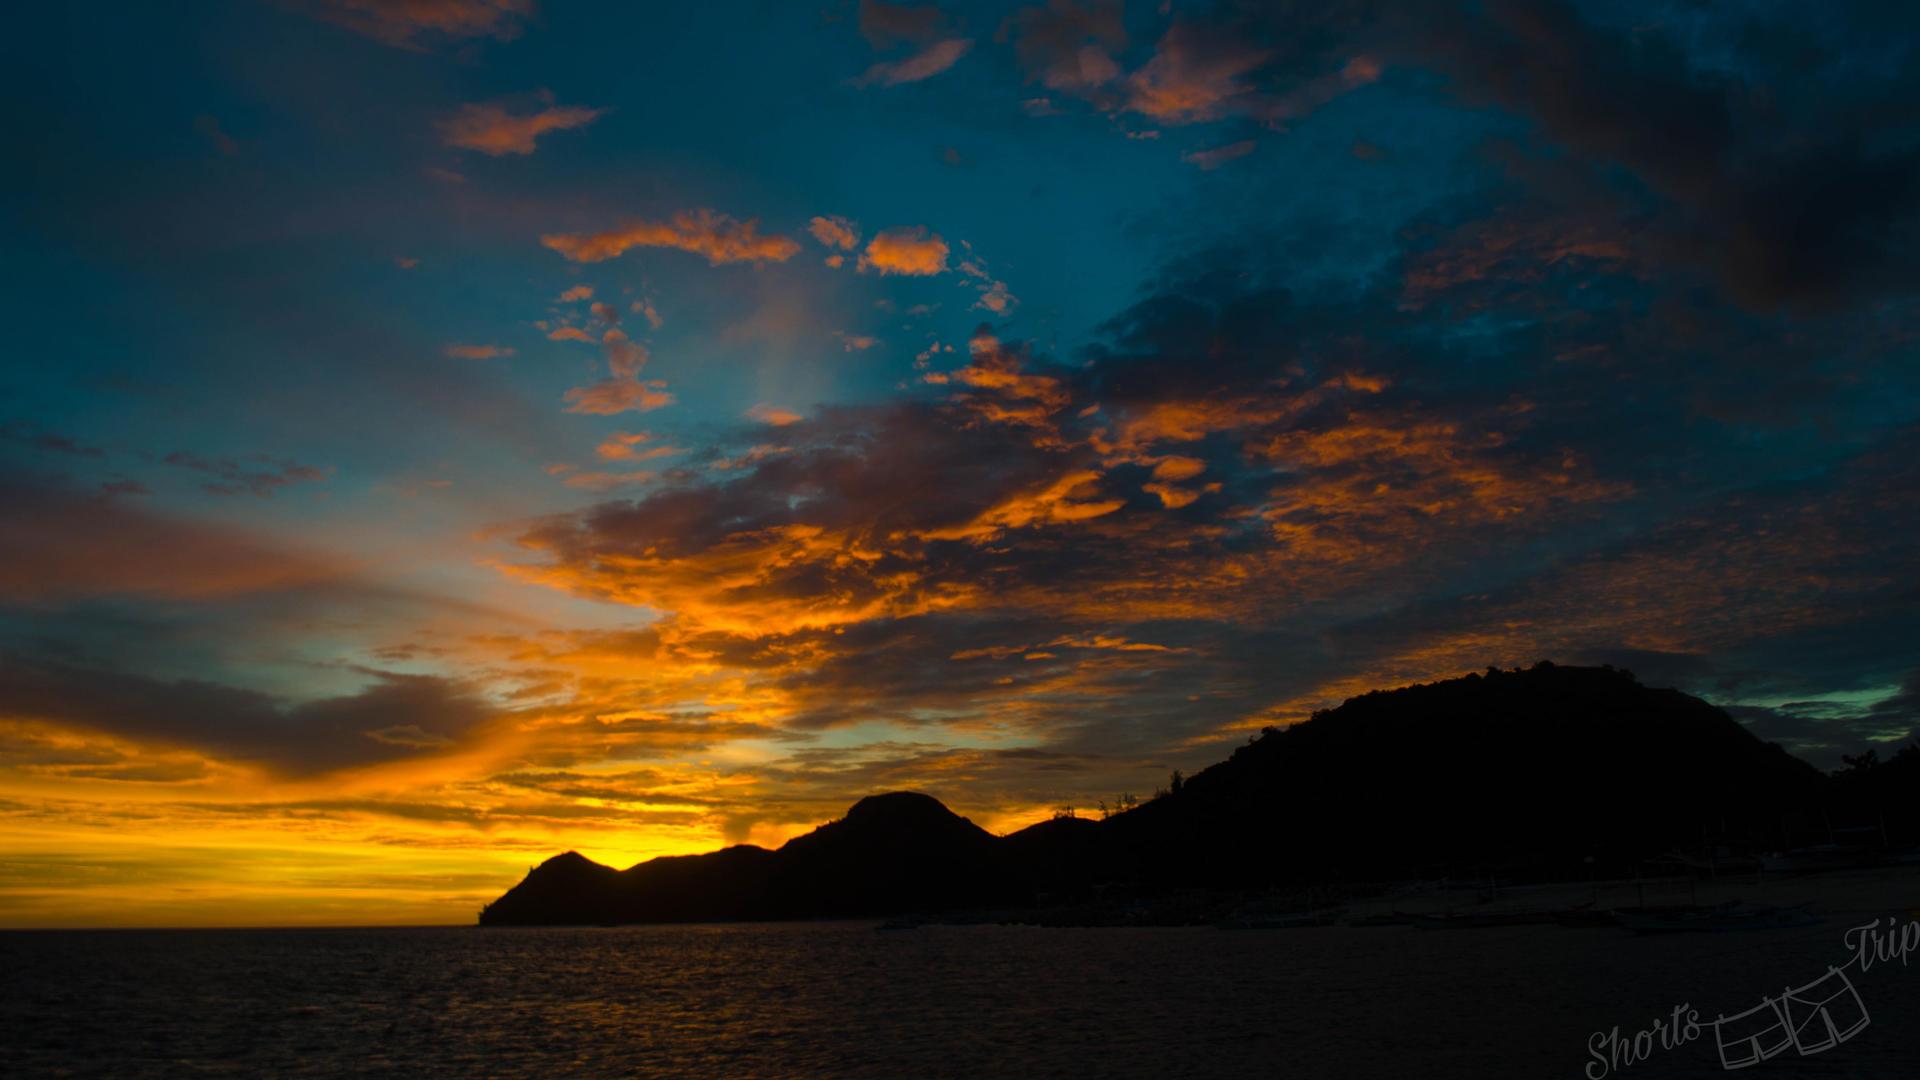 mararison sunset, malalison sunset, mararison, malalison beach